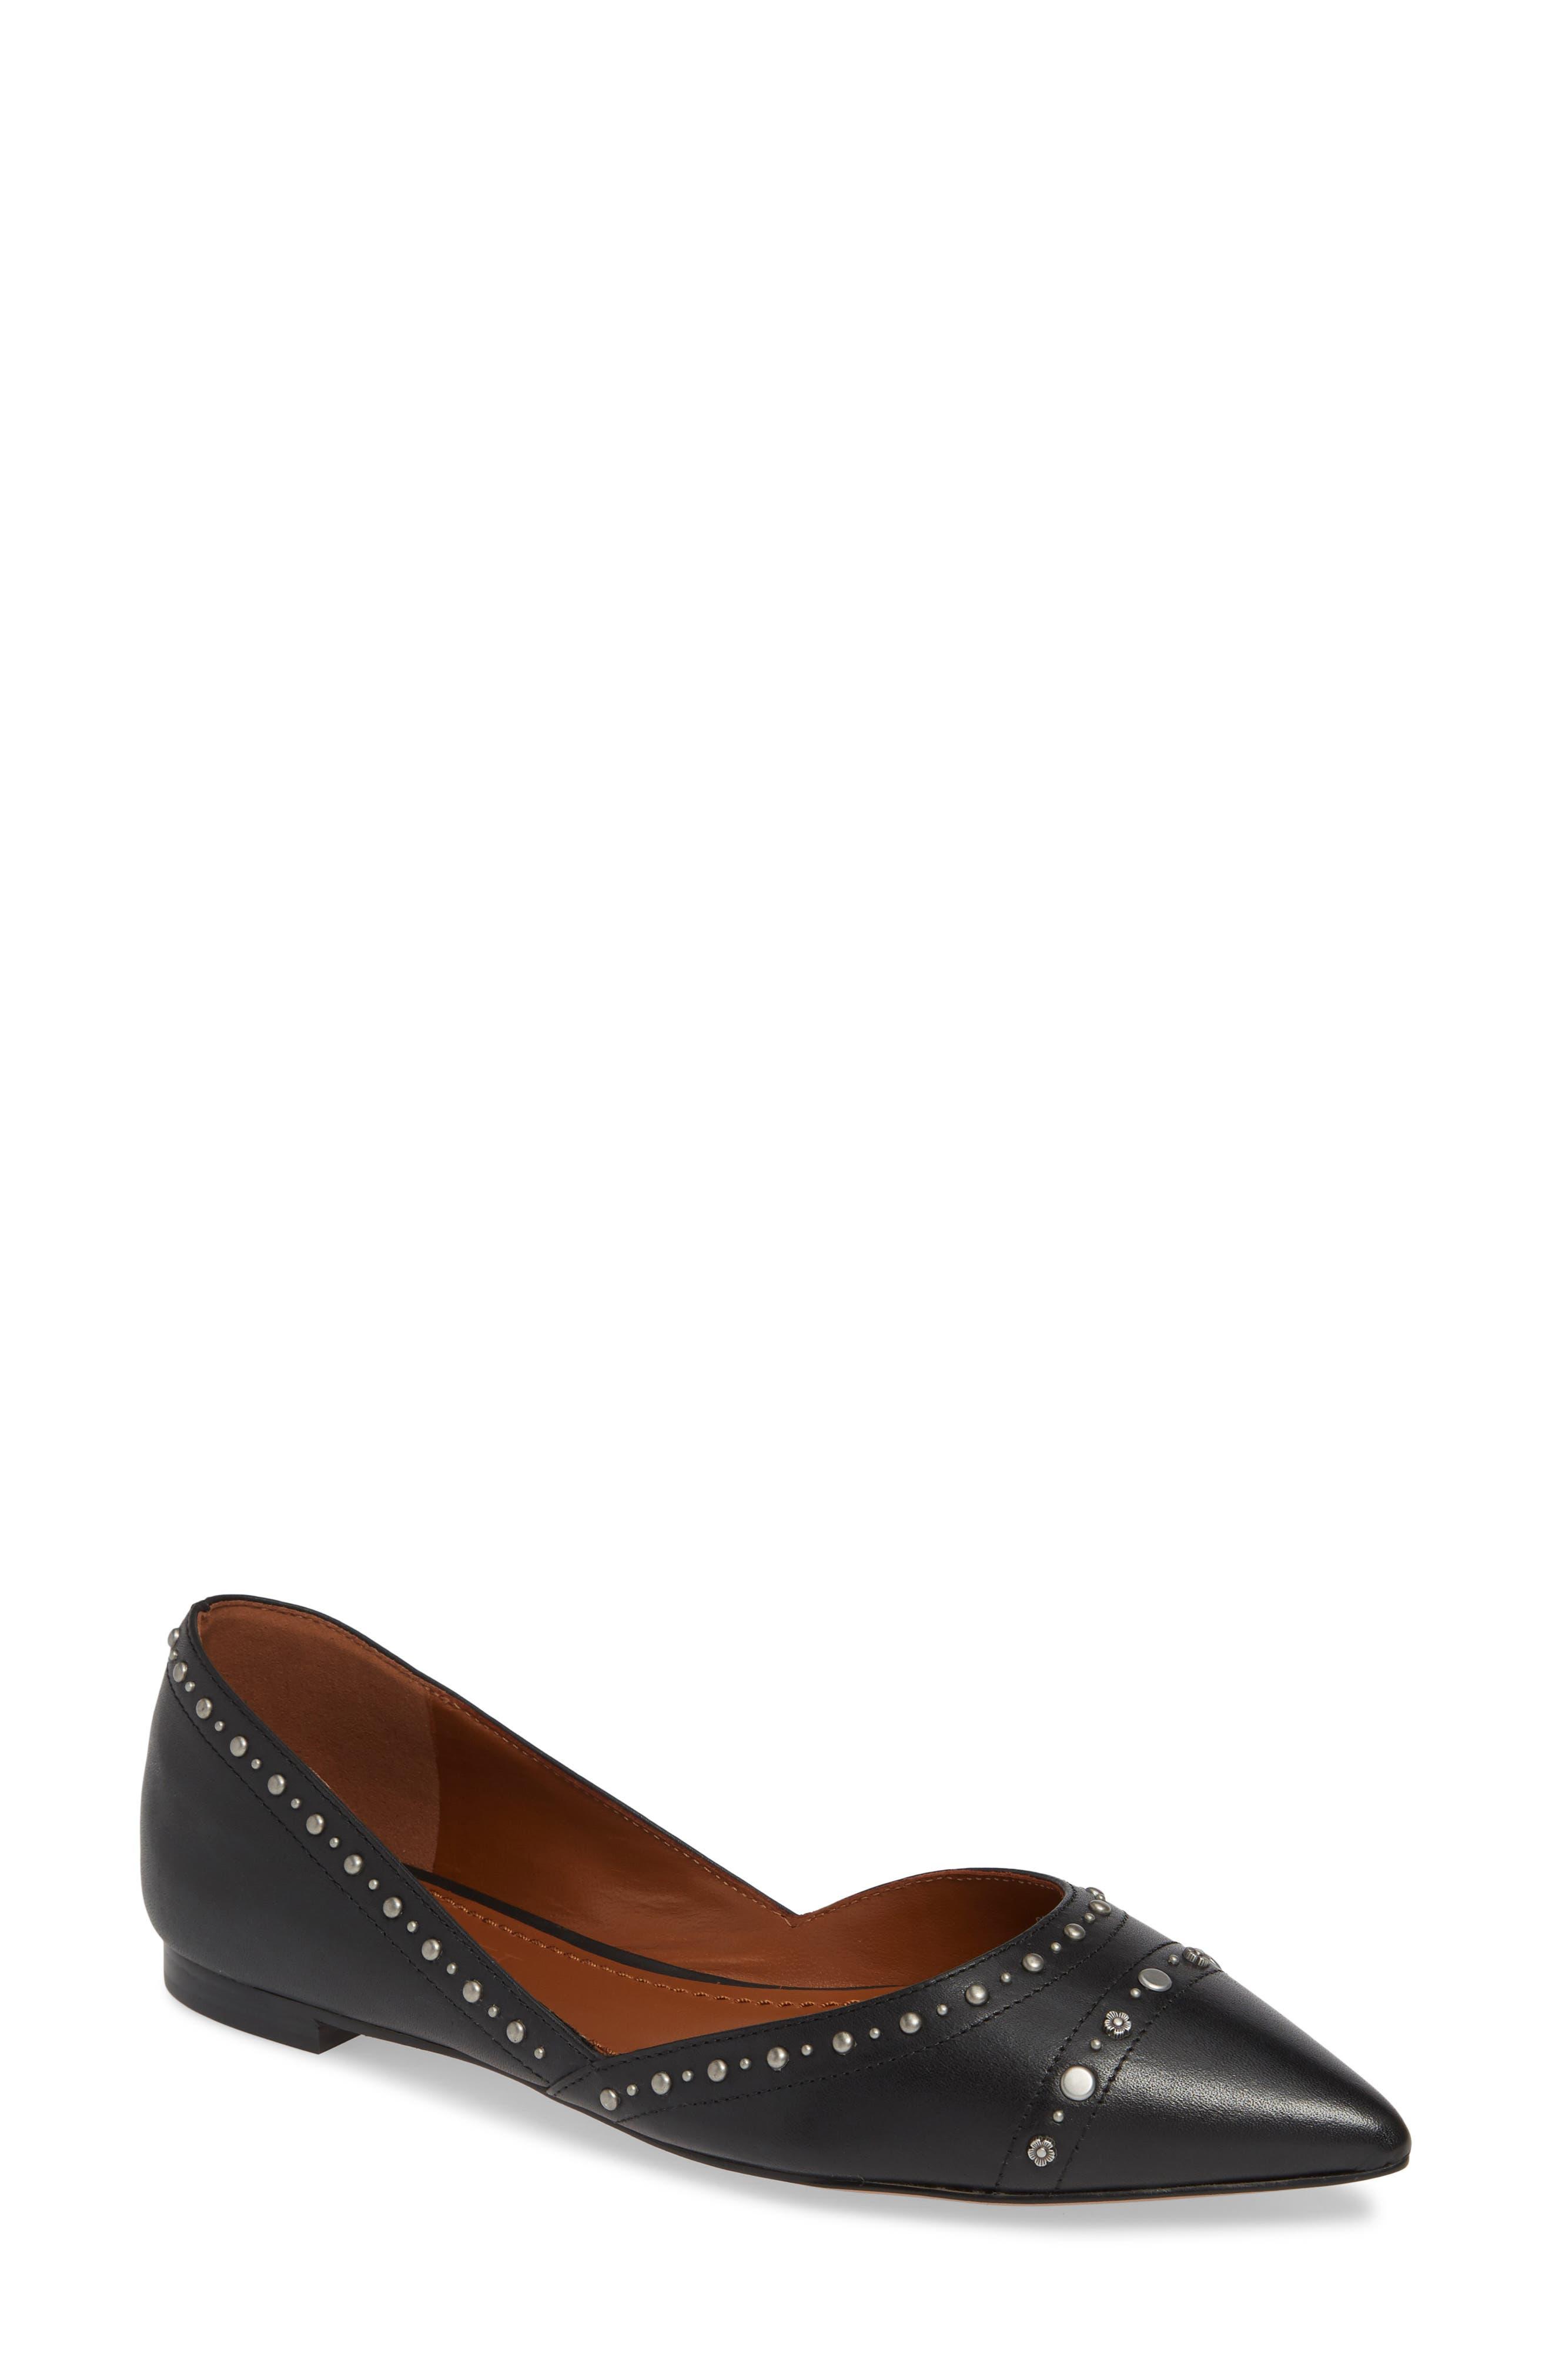 Valintina Pointed Toe Flat,                             Main thumbnail 1, color,                             BLACK LEATHER